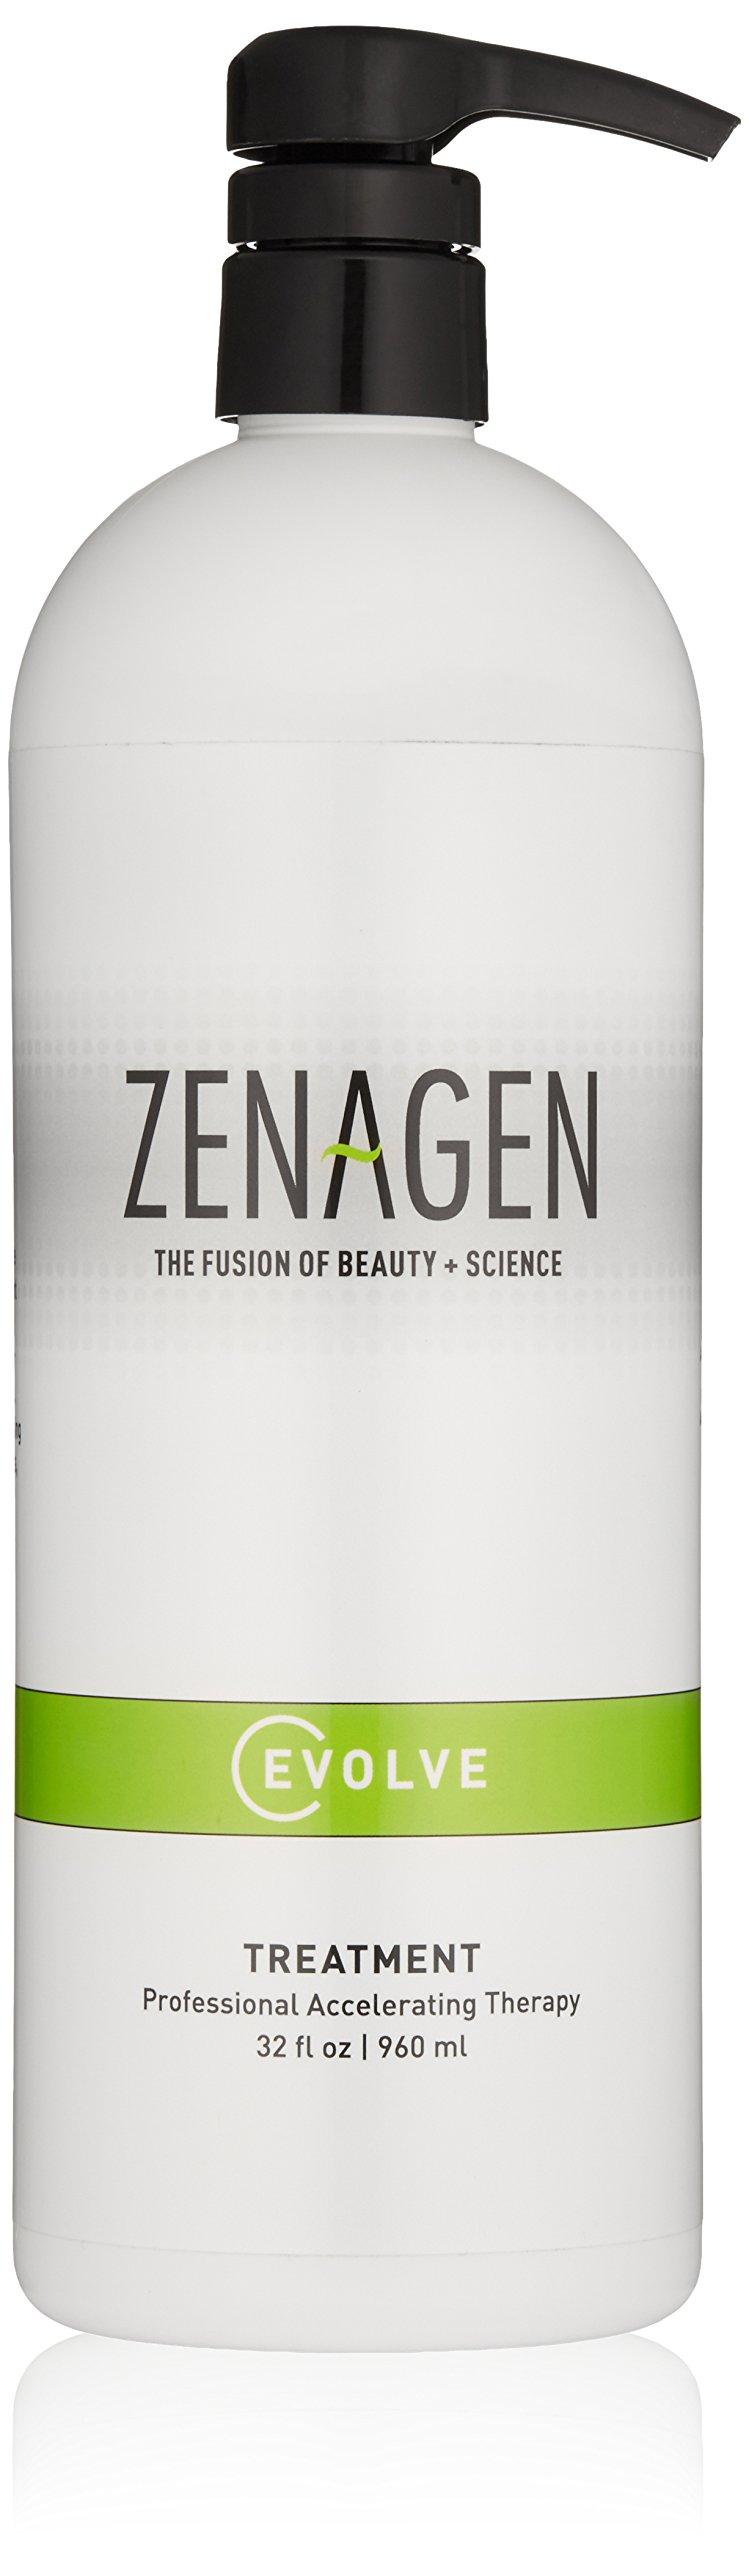 Zenagen Evolve Unisex Hair Treatment, 32 Fl Oz